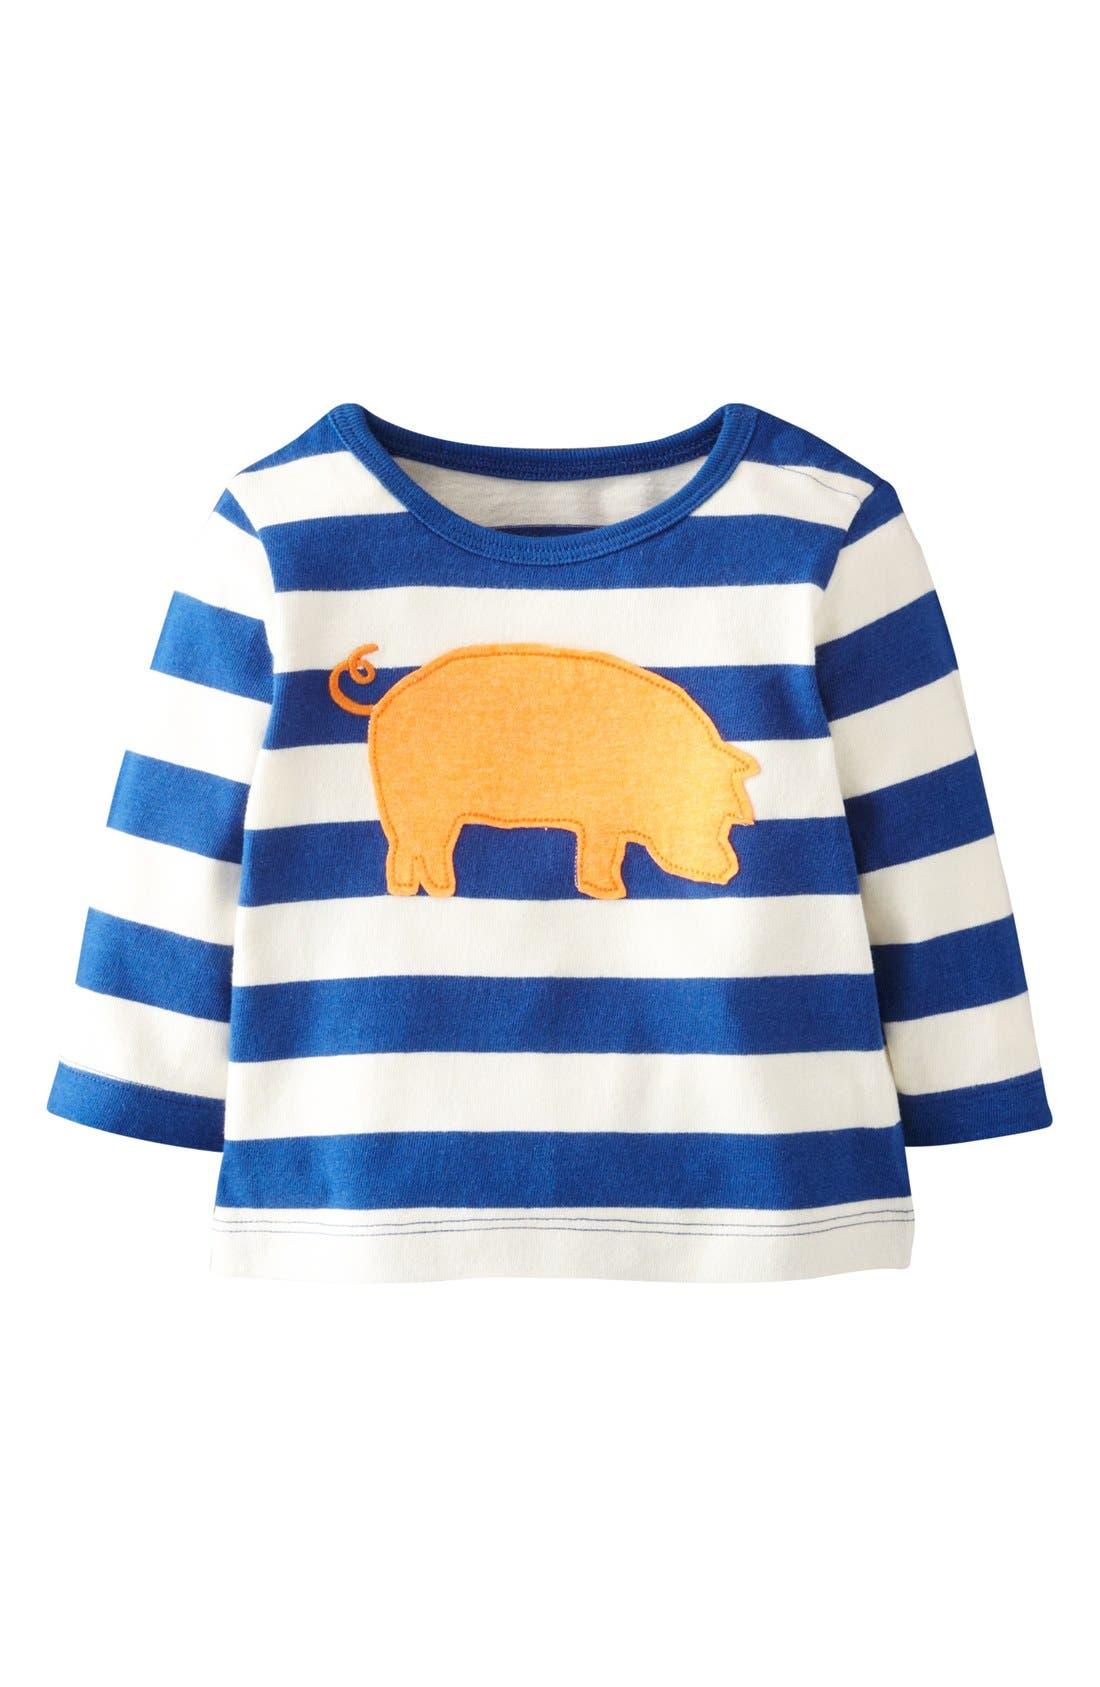 Main Image - Mini Boden 'Farmyard Appliqué' T-Shirt (Baby Boys)